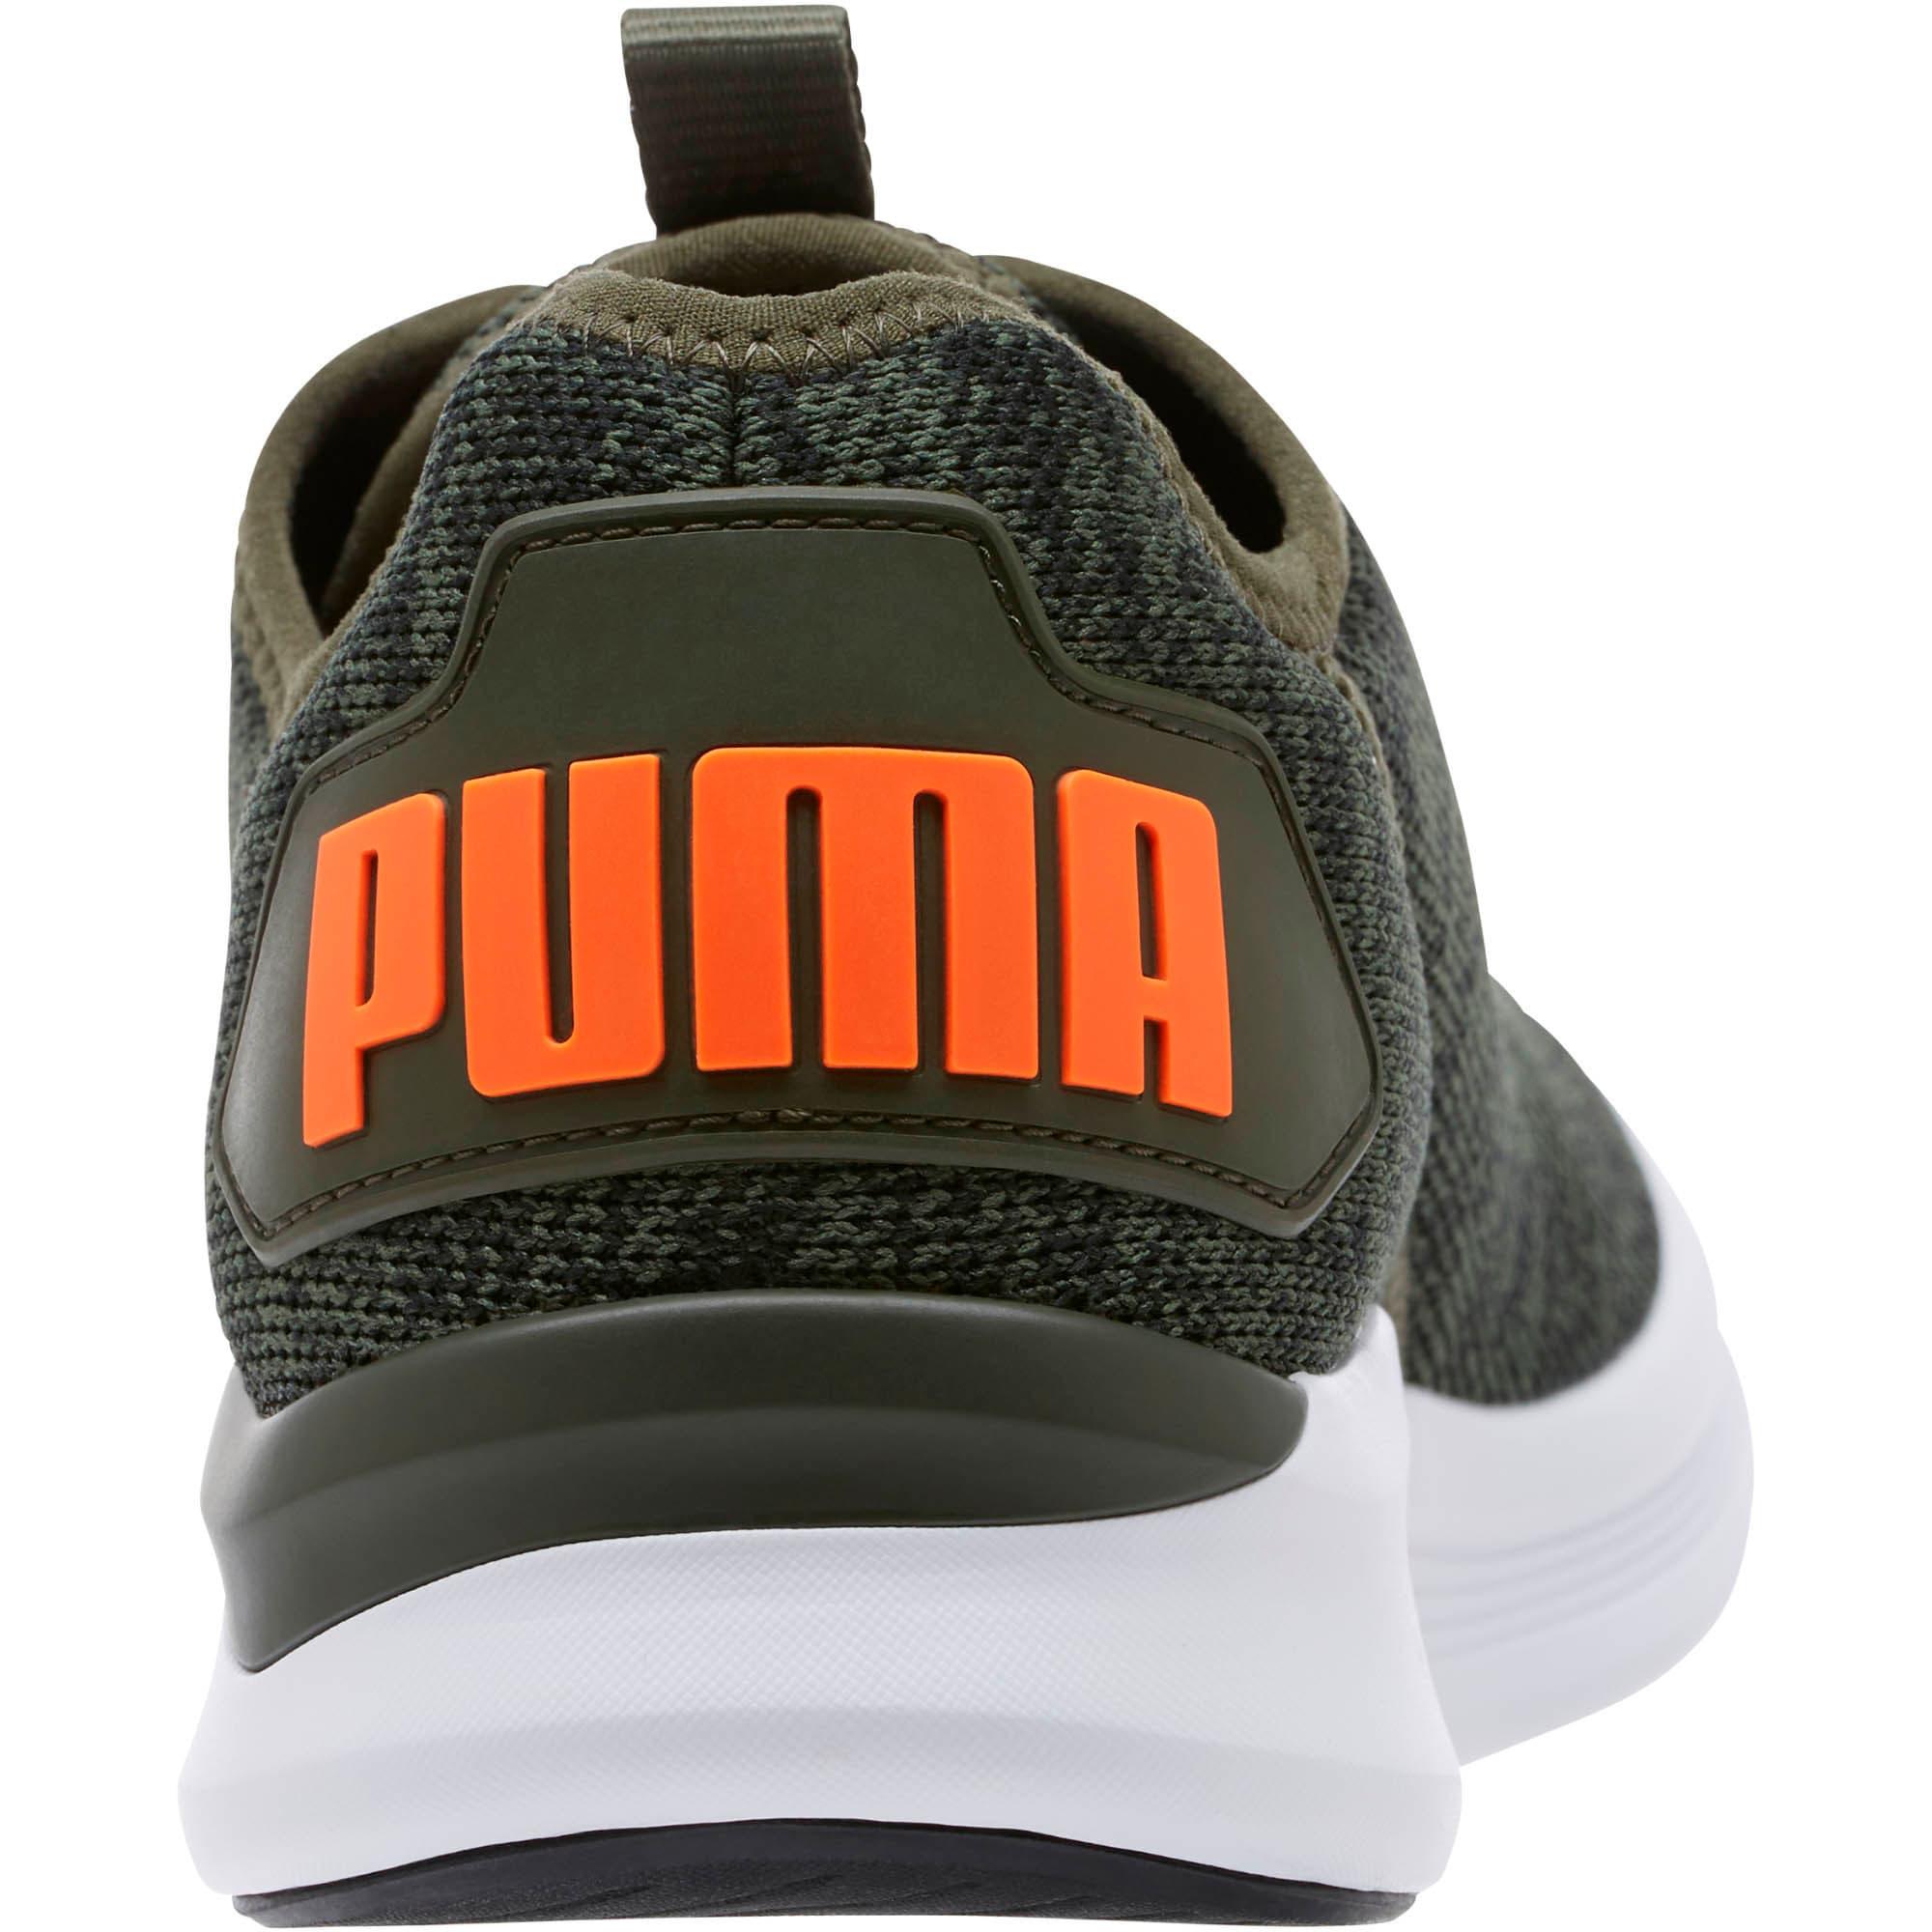 Thumbnail 4 of Ballast Men's Running Shoes, Forest Night-Black-Orange, medium